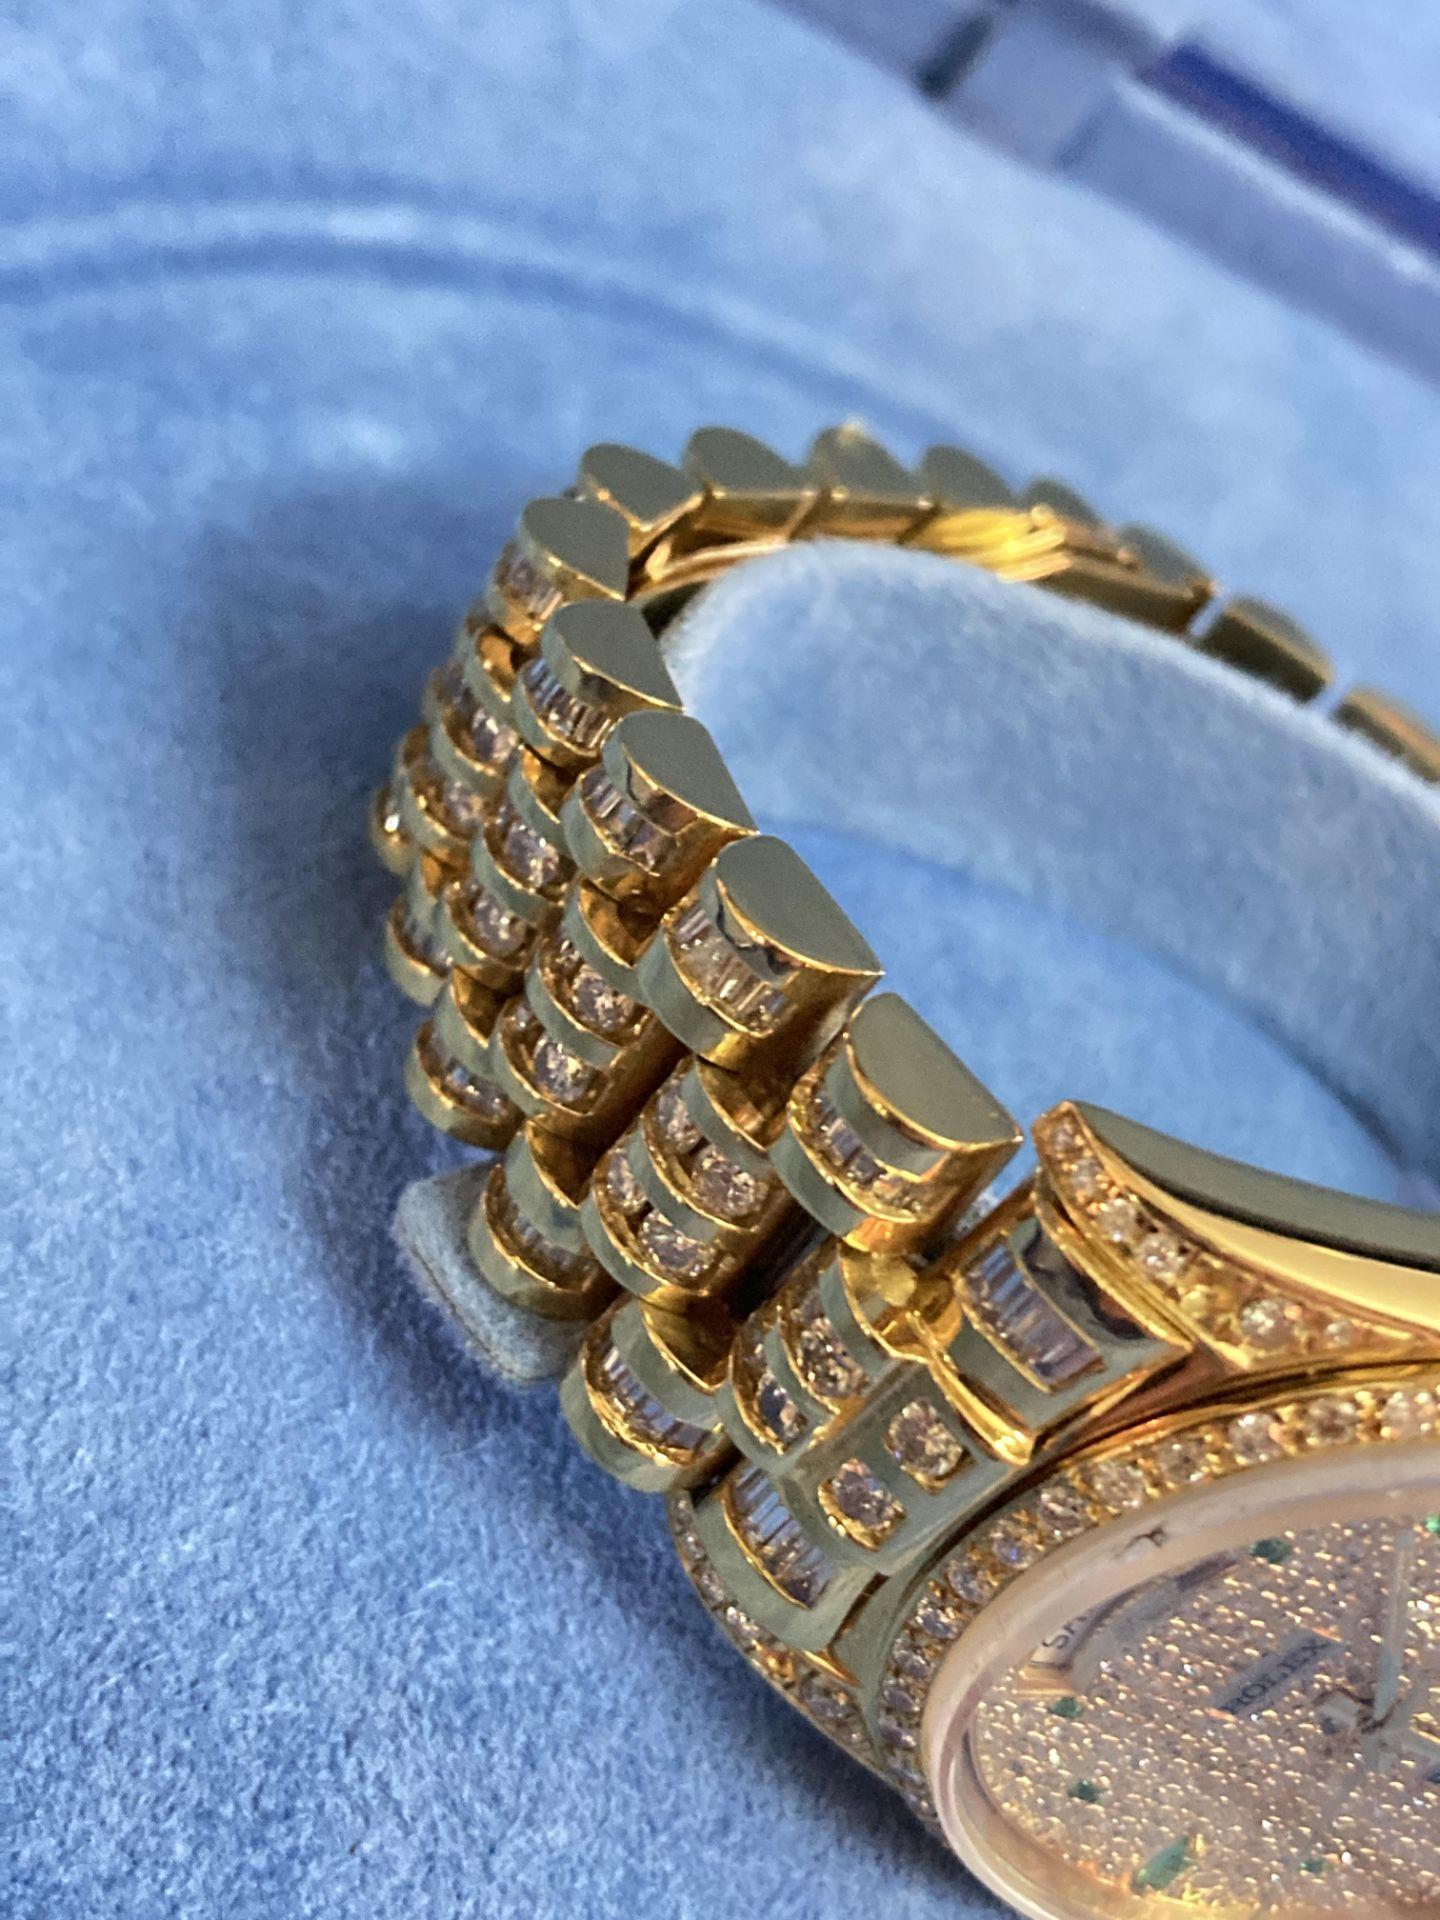 GENTS 36mm ROLEX DAYDATE YELLOW GOLD DIAMOND WATCH - Image 8 of 21